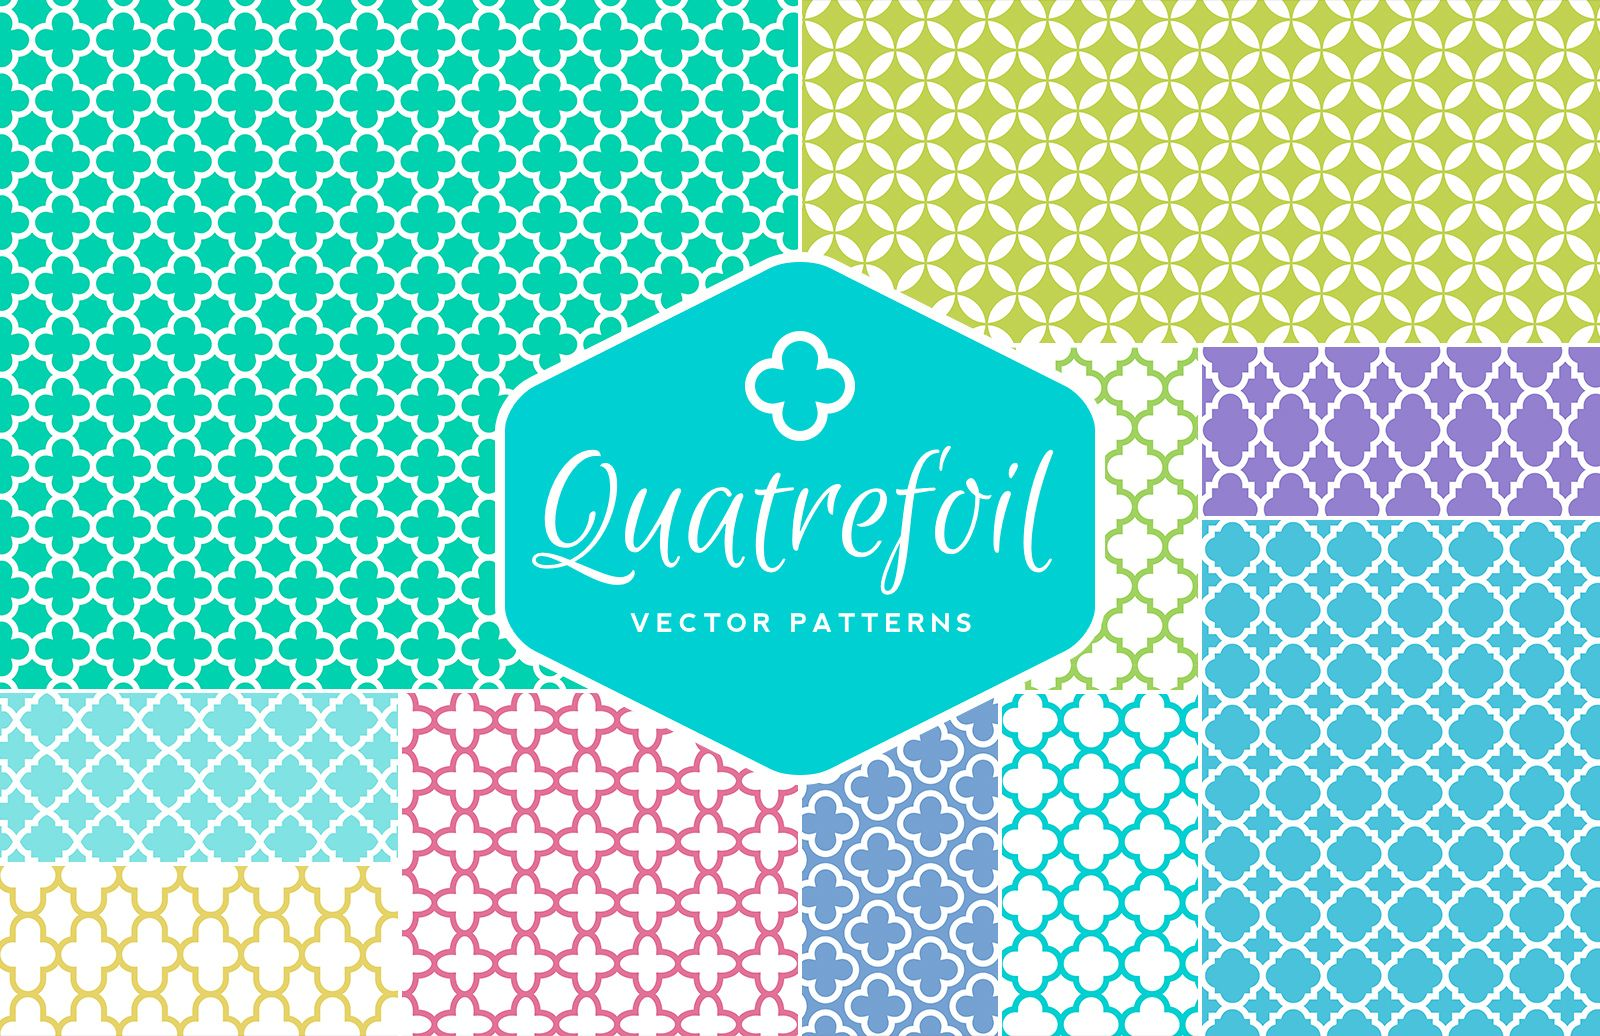 Seamless  Vector  Quatrefoil  Patterns  Preview 1